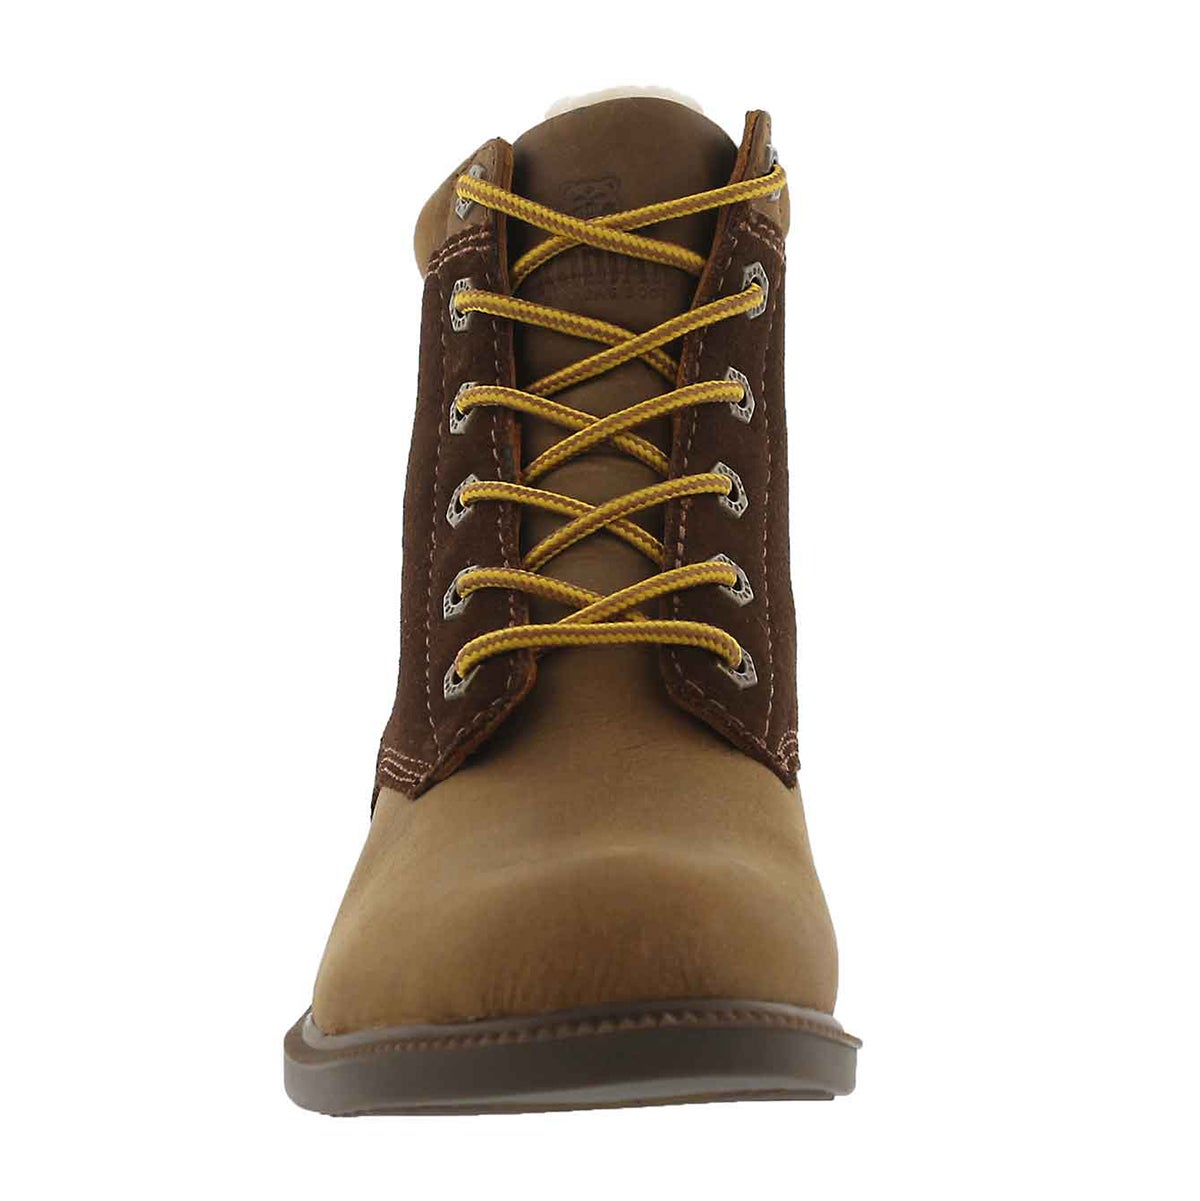 Lds Original Fleece wheat wp laceup boot